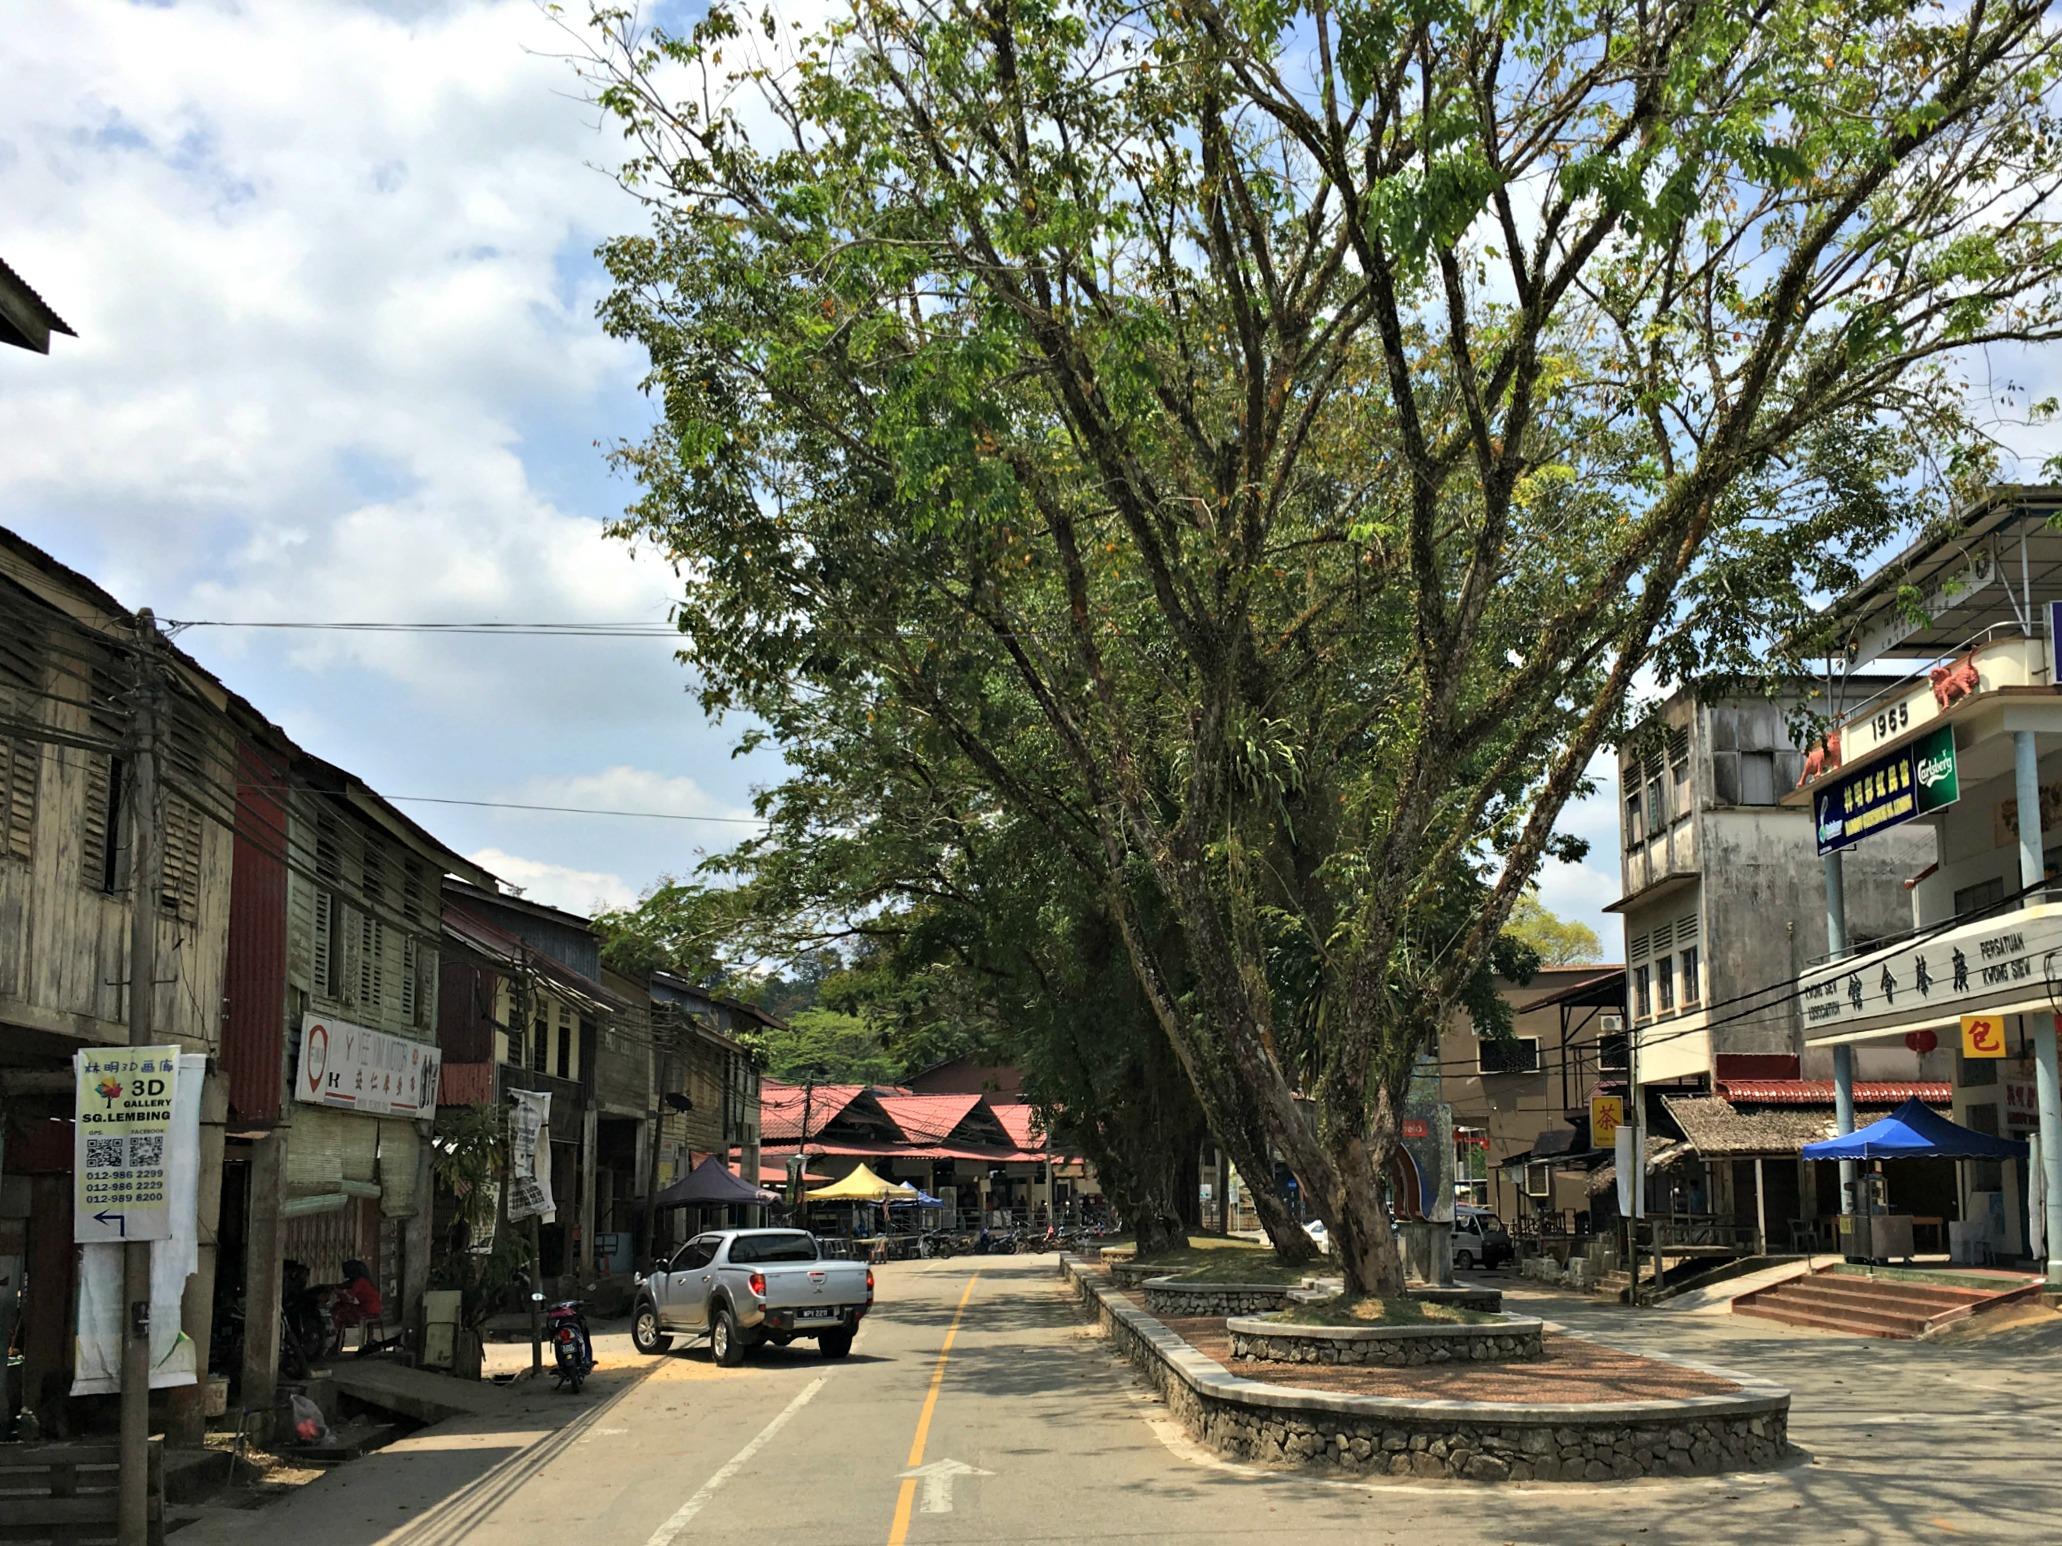 My Malaysia: Time Capsule Retreat in Sungai Lembing, Pahang